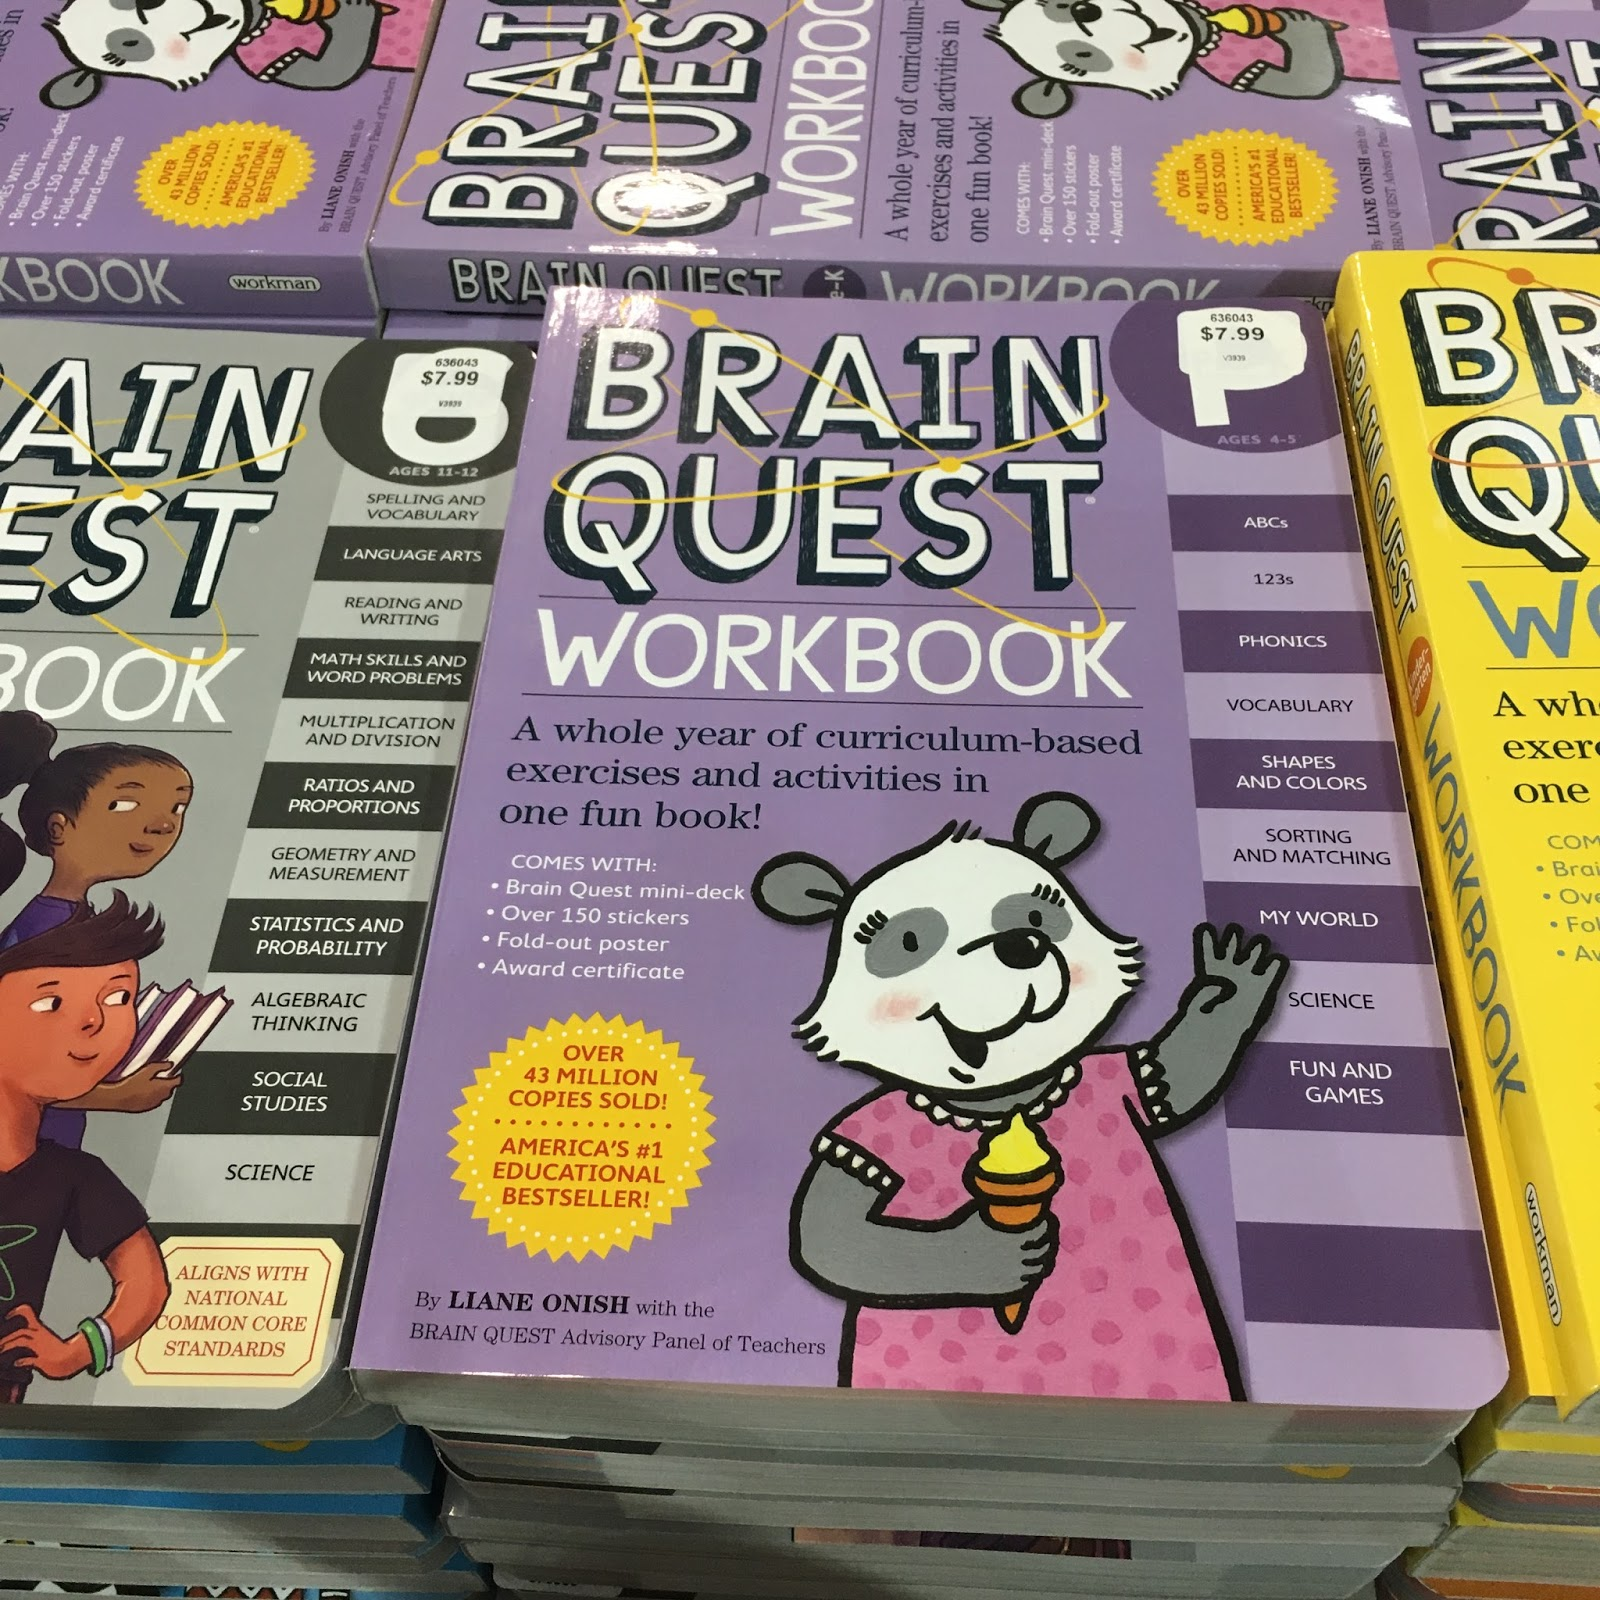 medium resolution of the Costco Connoisseur: Save on Grade School Workbooks at Costco!